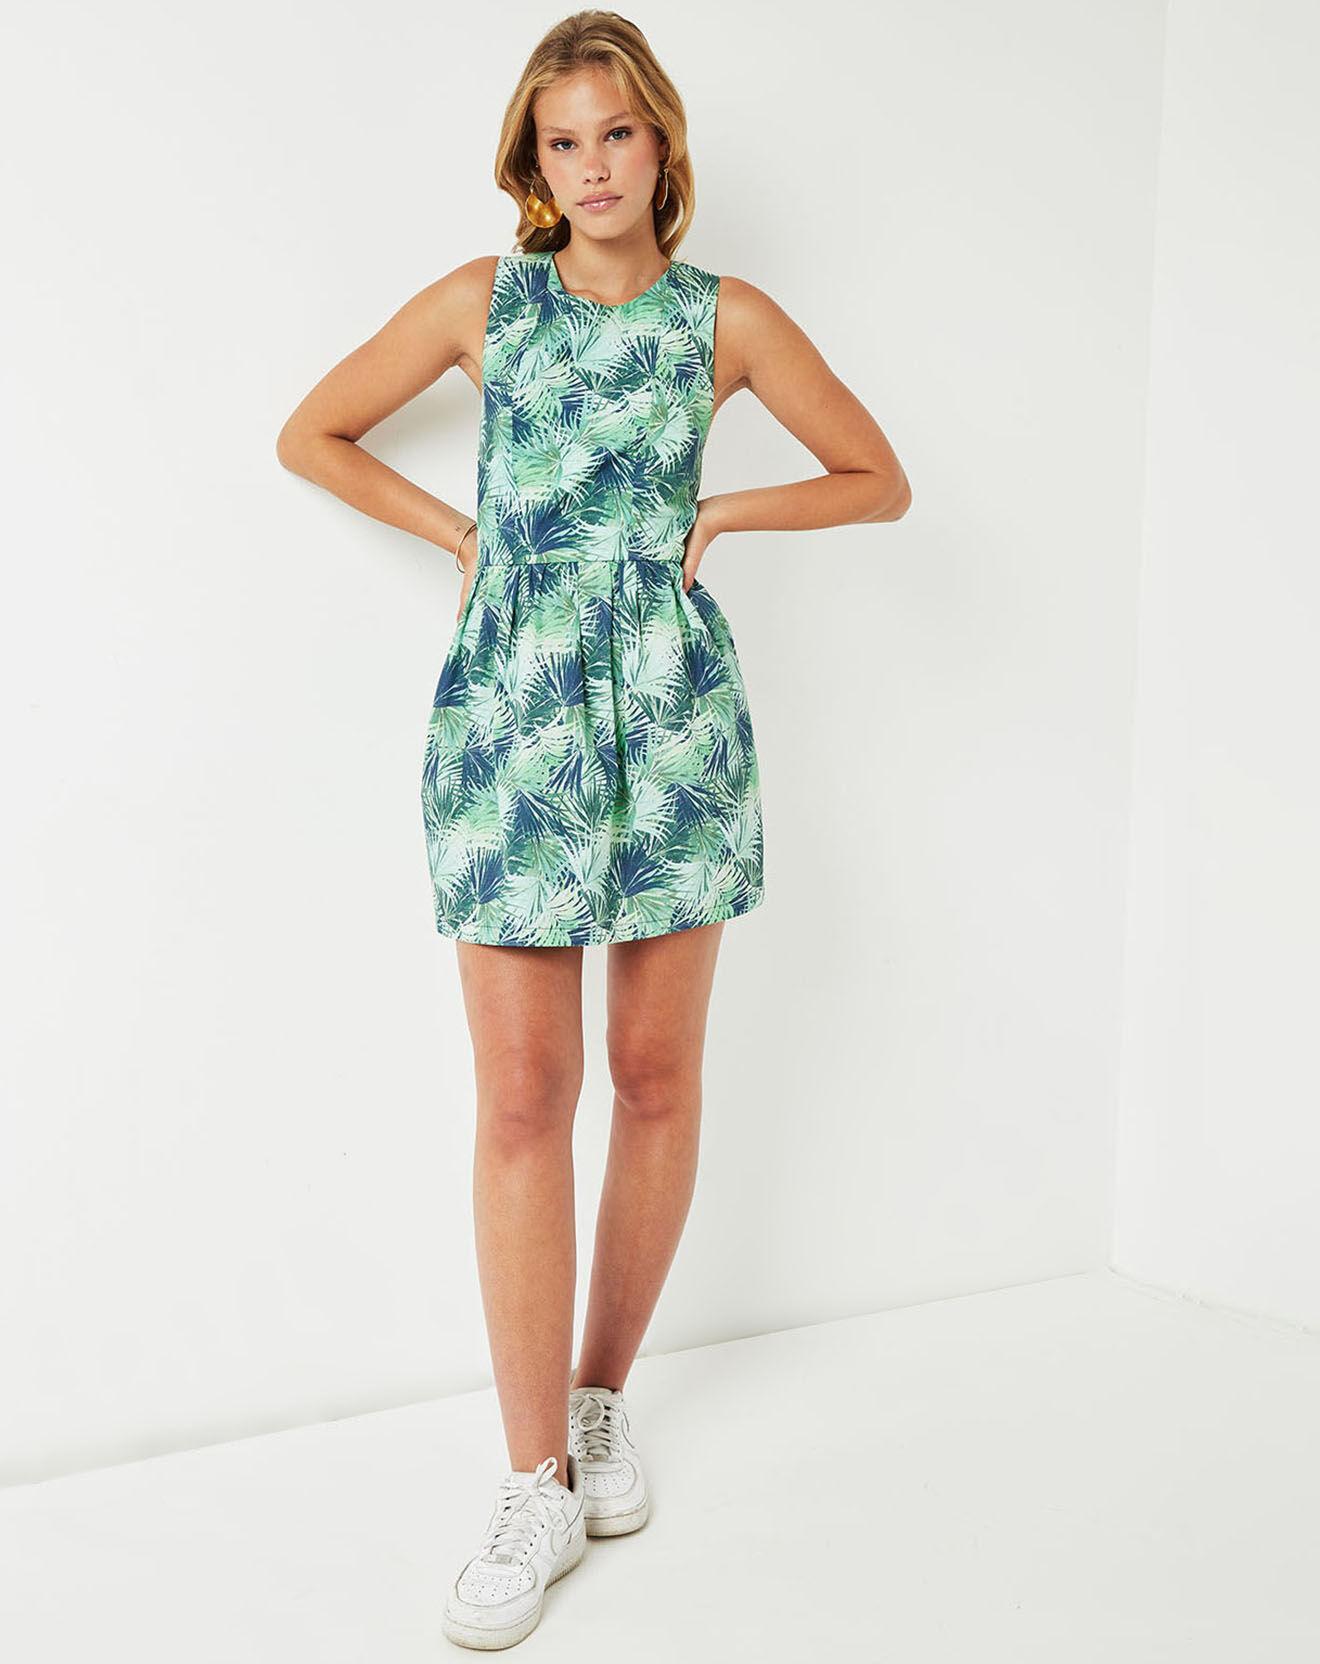 Robe Ebene imprimée bleu marine/vert - Cuisse de Grenouille - Modalova